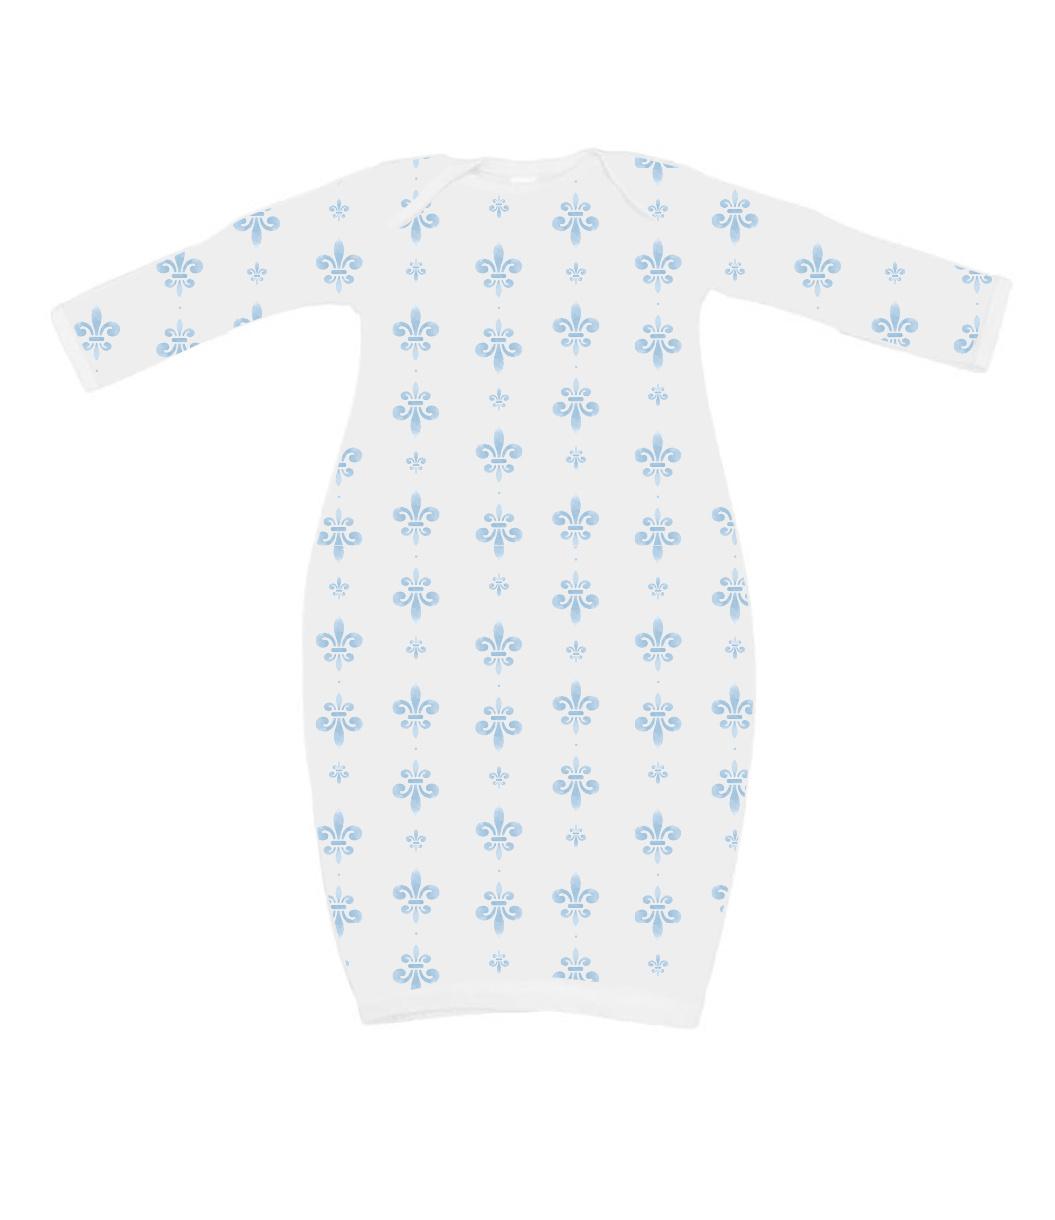 Nola Tawk Fleur de Lis Organic Cotton PJ Set - Blue